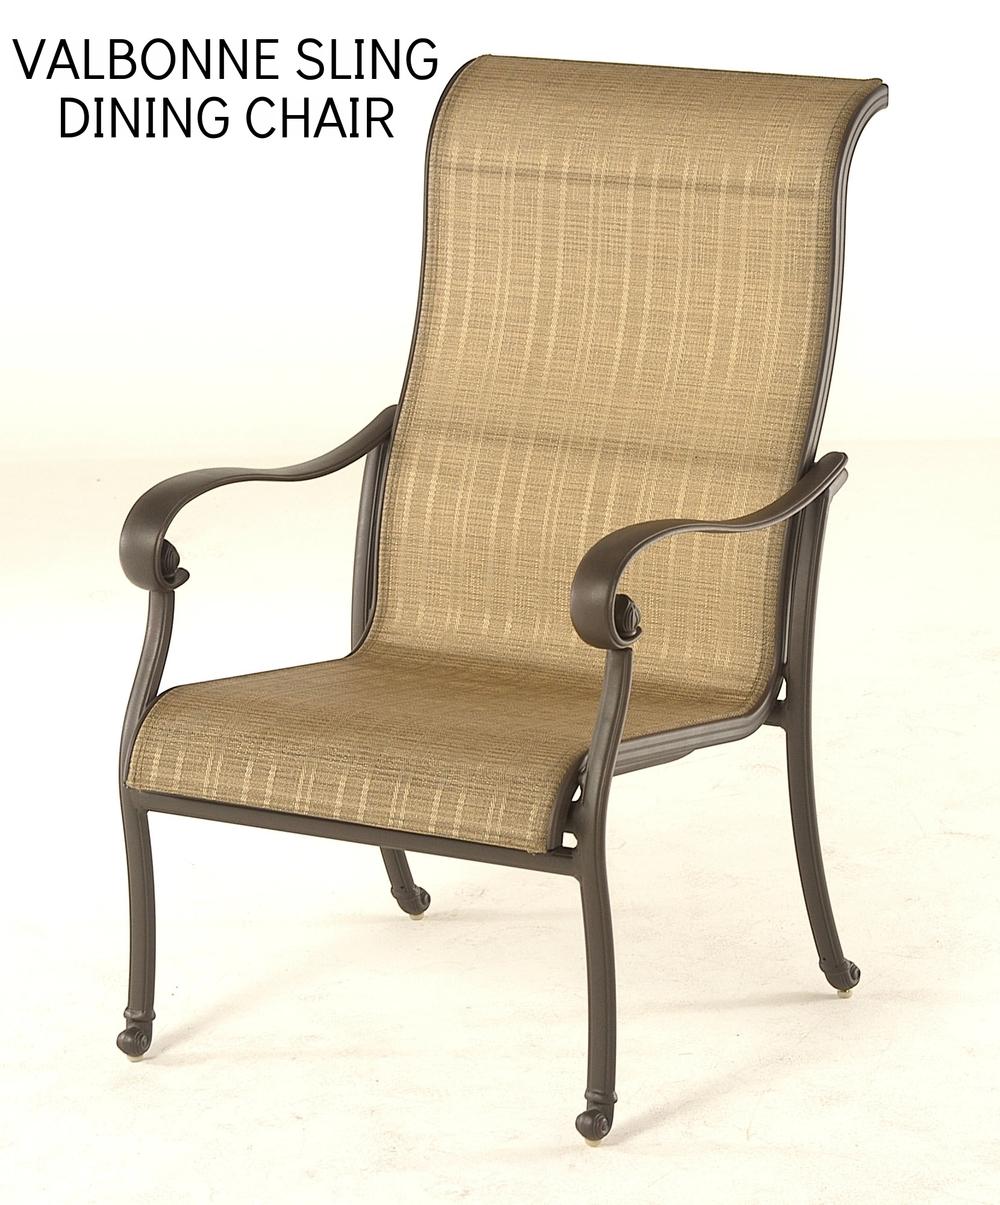 Valbonne Sling Dining Chair.JPG